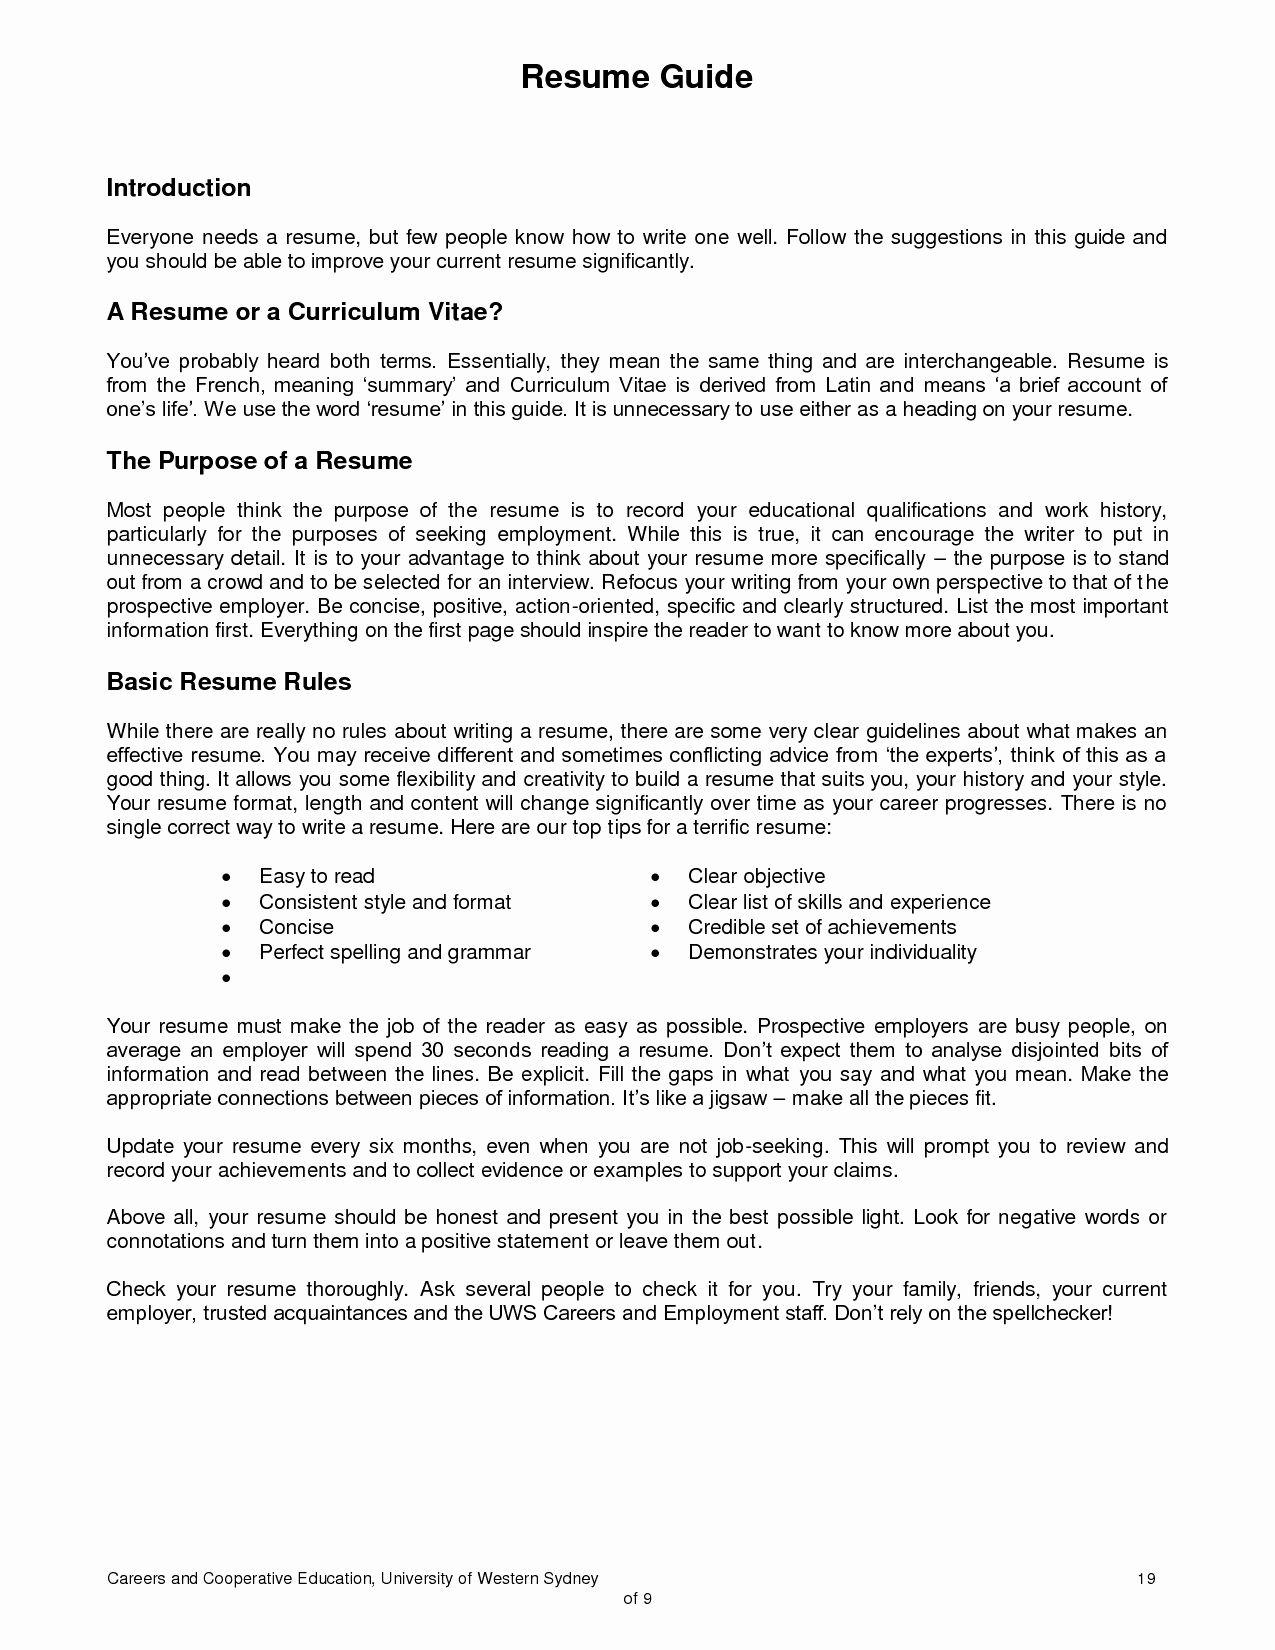 Resume Format Employers Prefer Resume Format Resume Skills Resume Examples First Job Resume